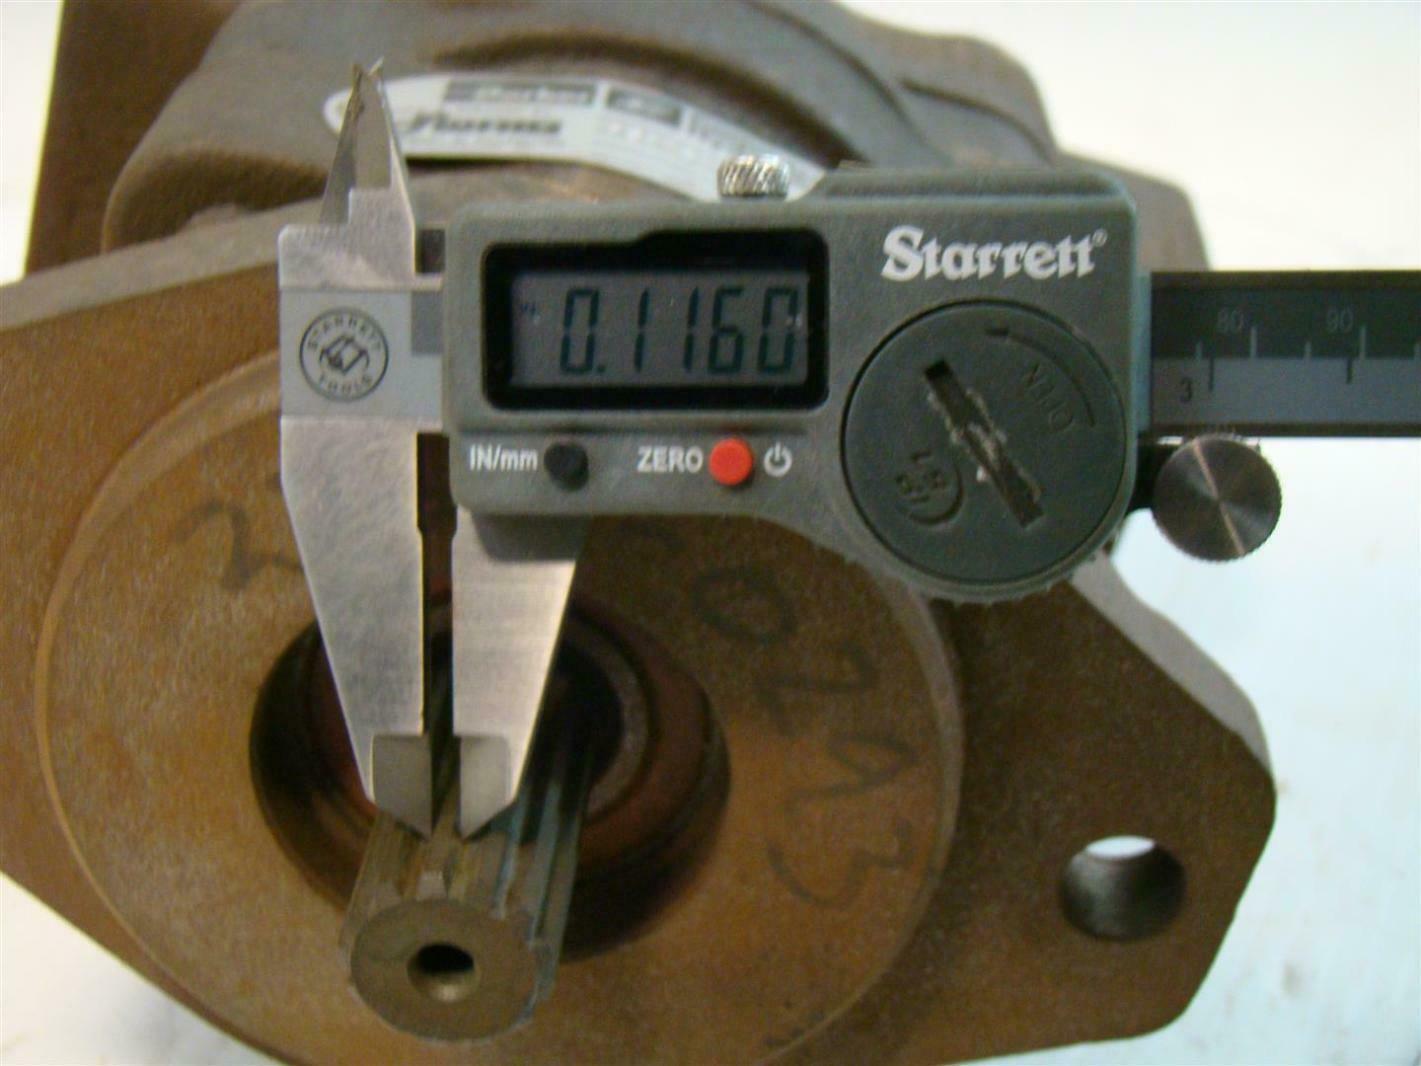 Florig parker commercial hydraulics pump 1 1 4 p244942 ebay for Parker hydraulic pumps and motors